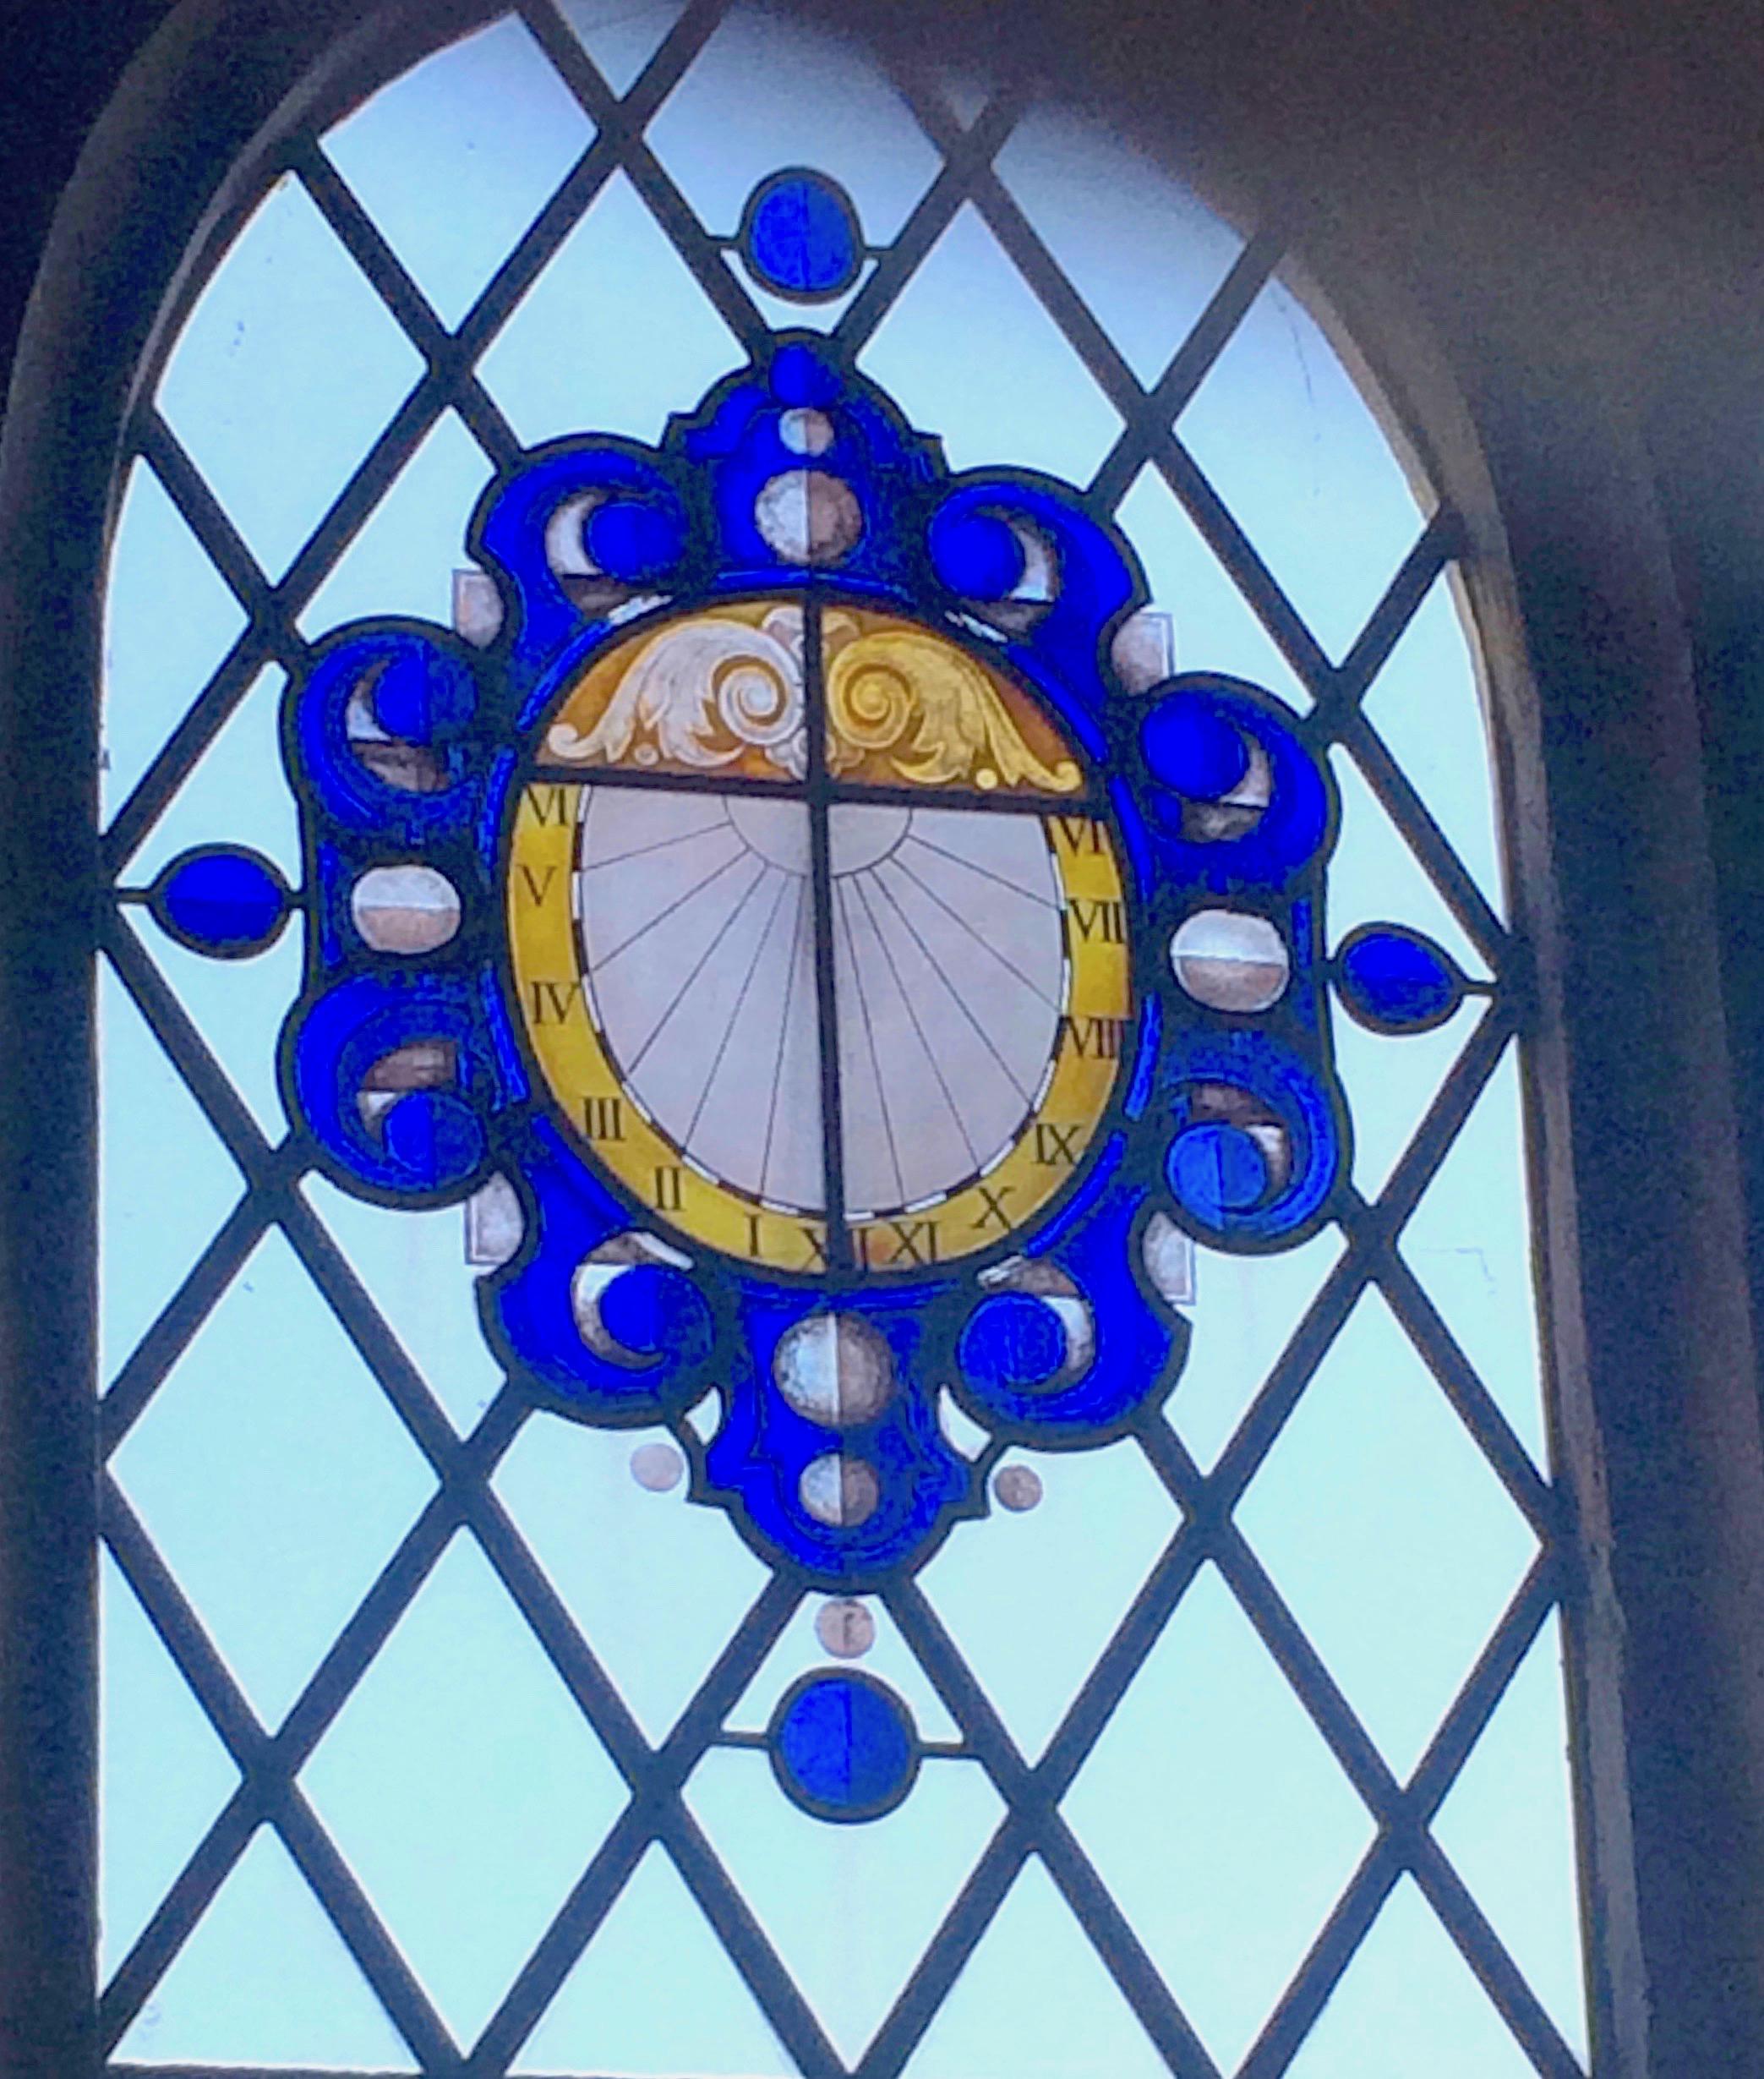 Toller Porcorum Church, Dorset - Stained Glass Sundial